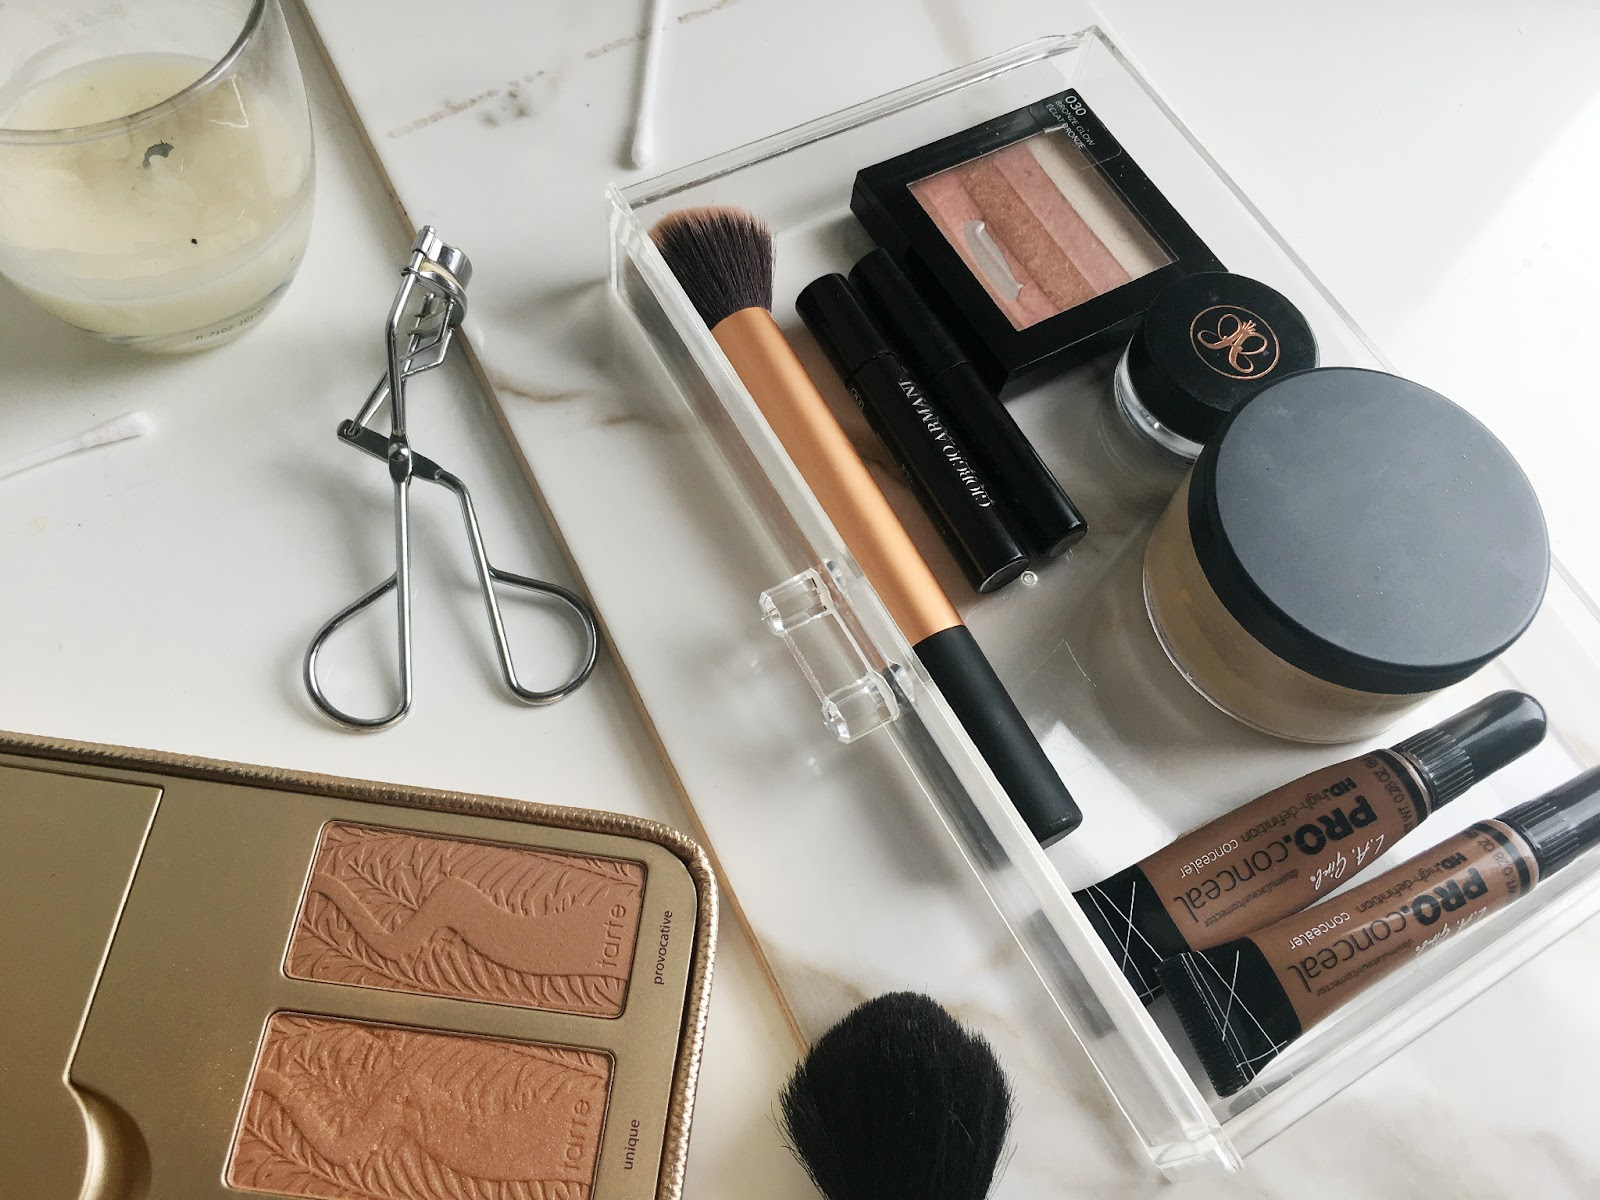 A 5 Minute Makeup Look